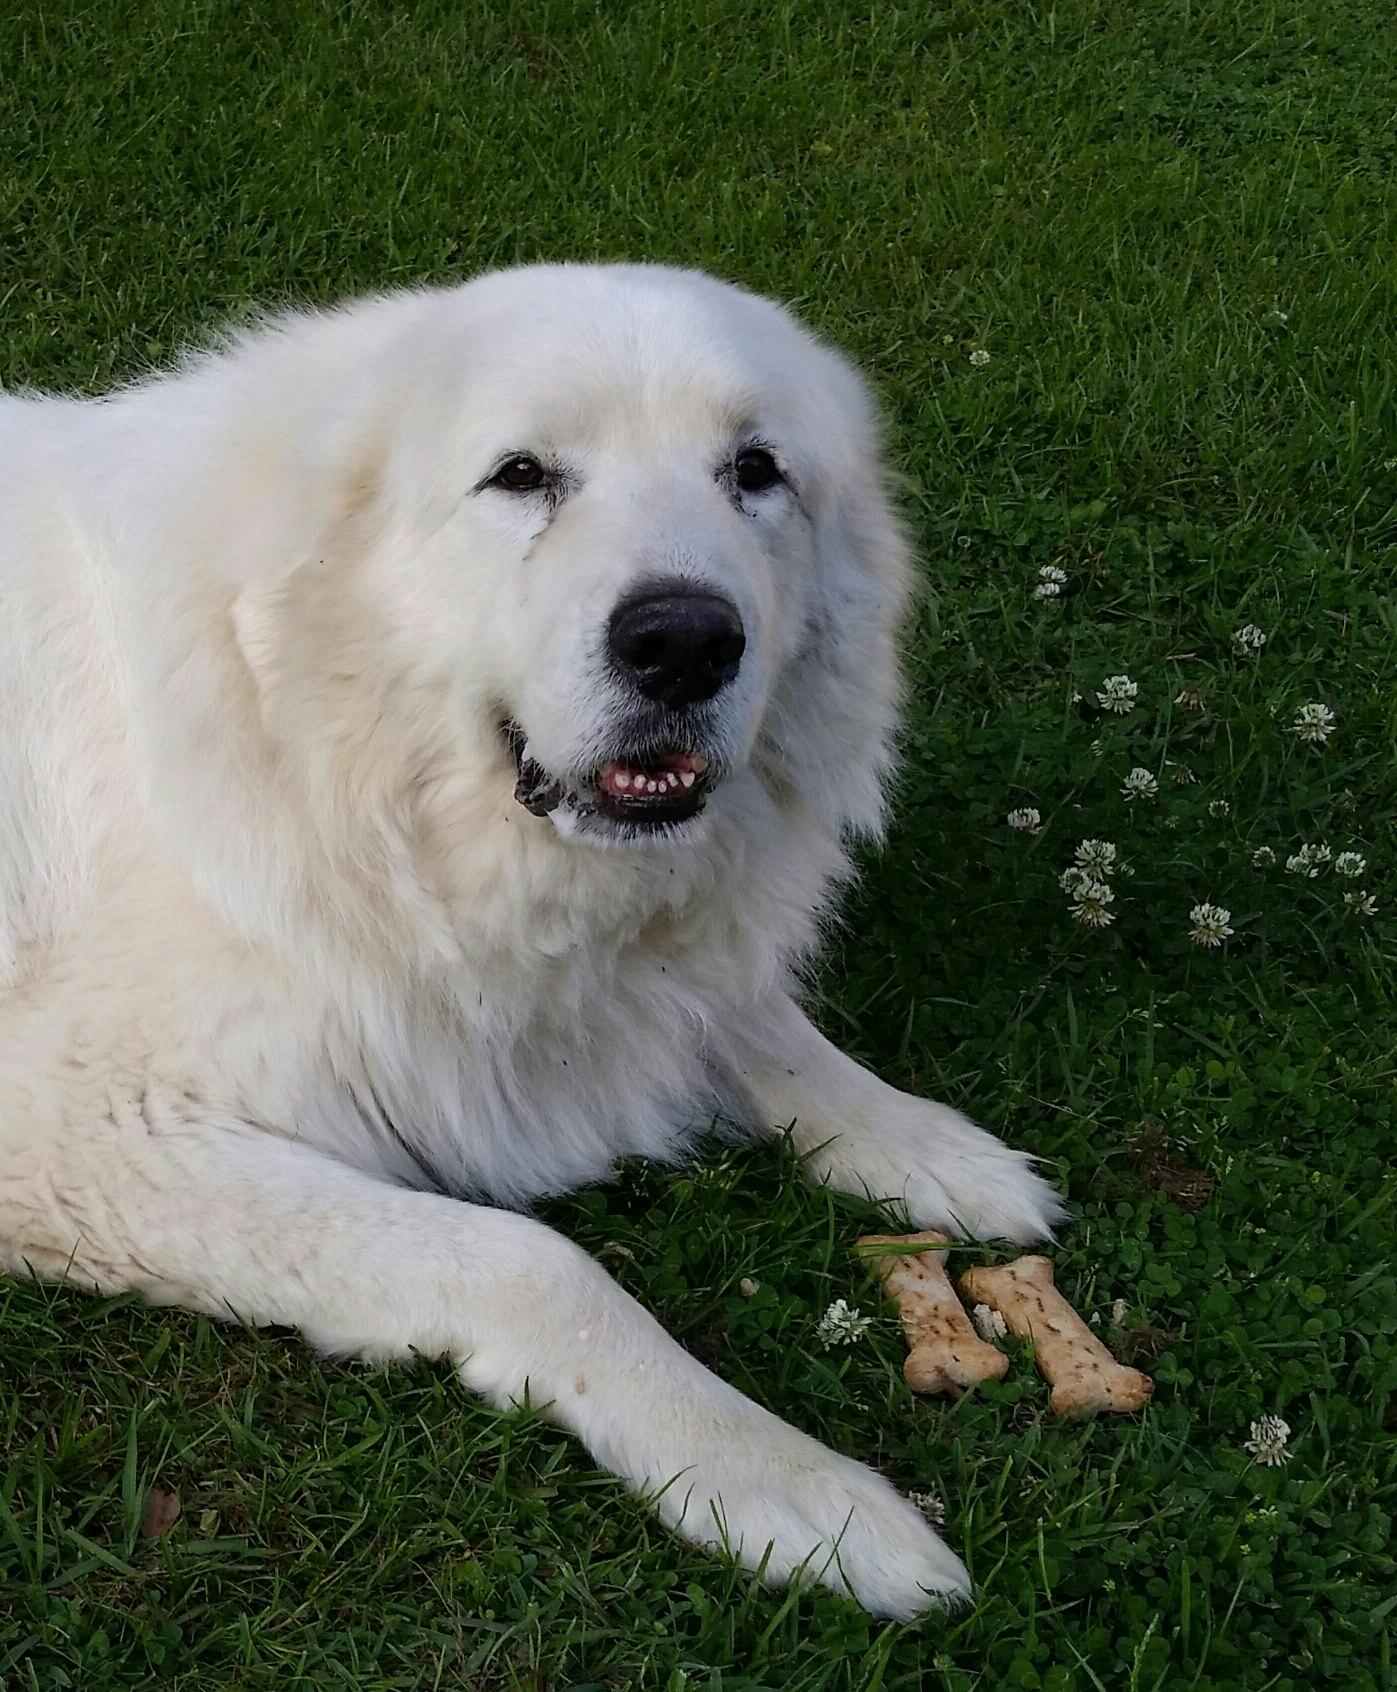 Goddi and his bones